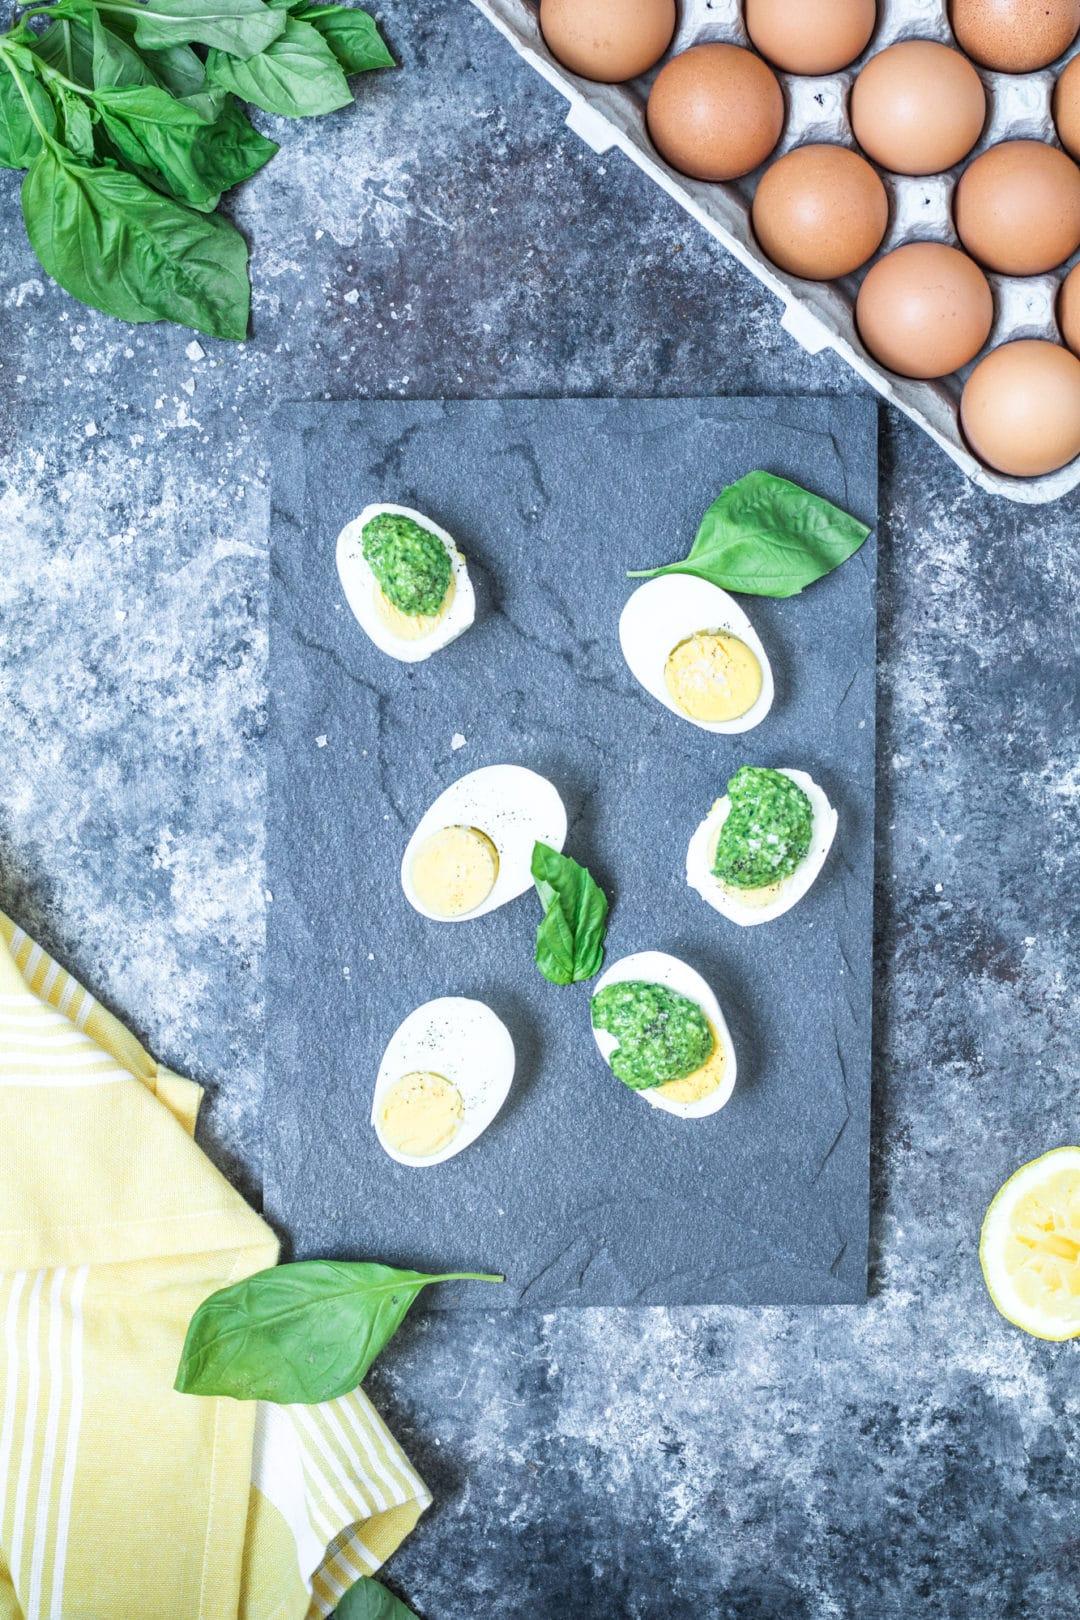 Parmesan Pesto Over Eggs - perfect for Easter or any Spring time occasion! #krollskorner #spring #easter #pesto